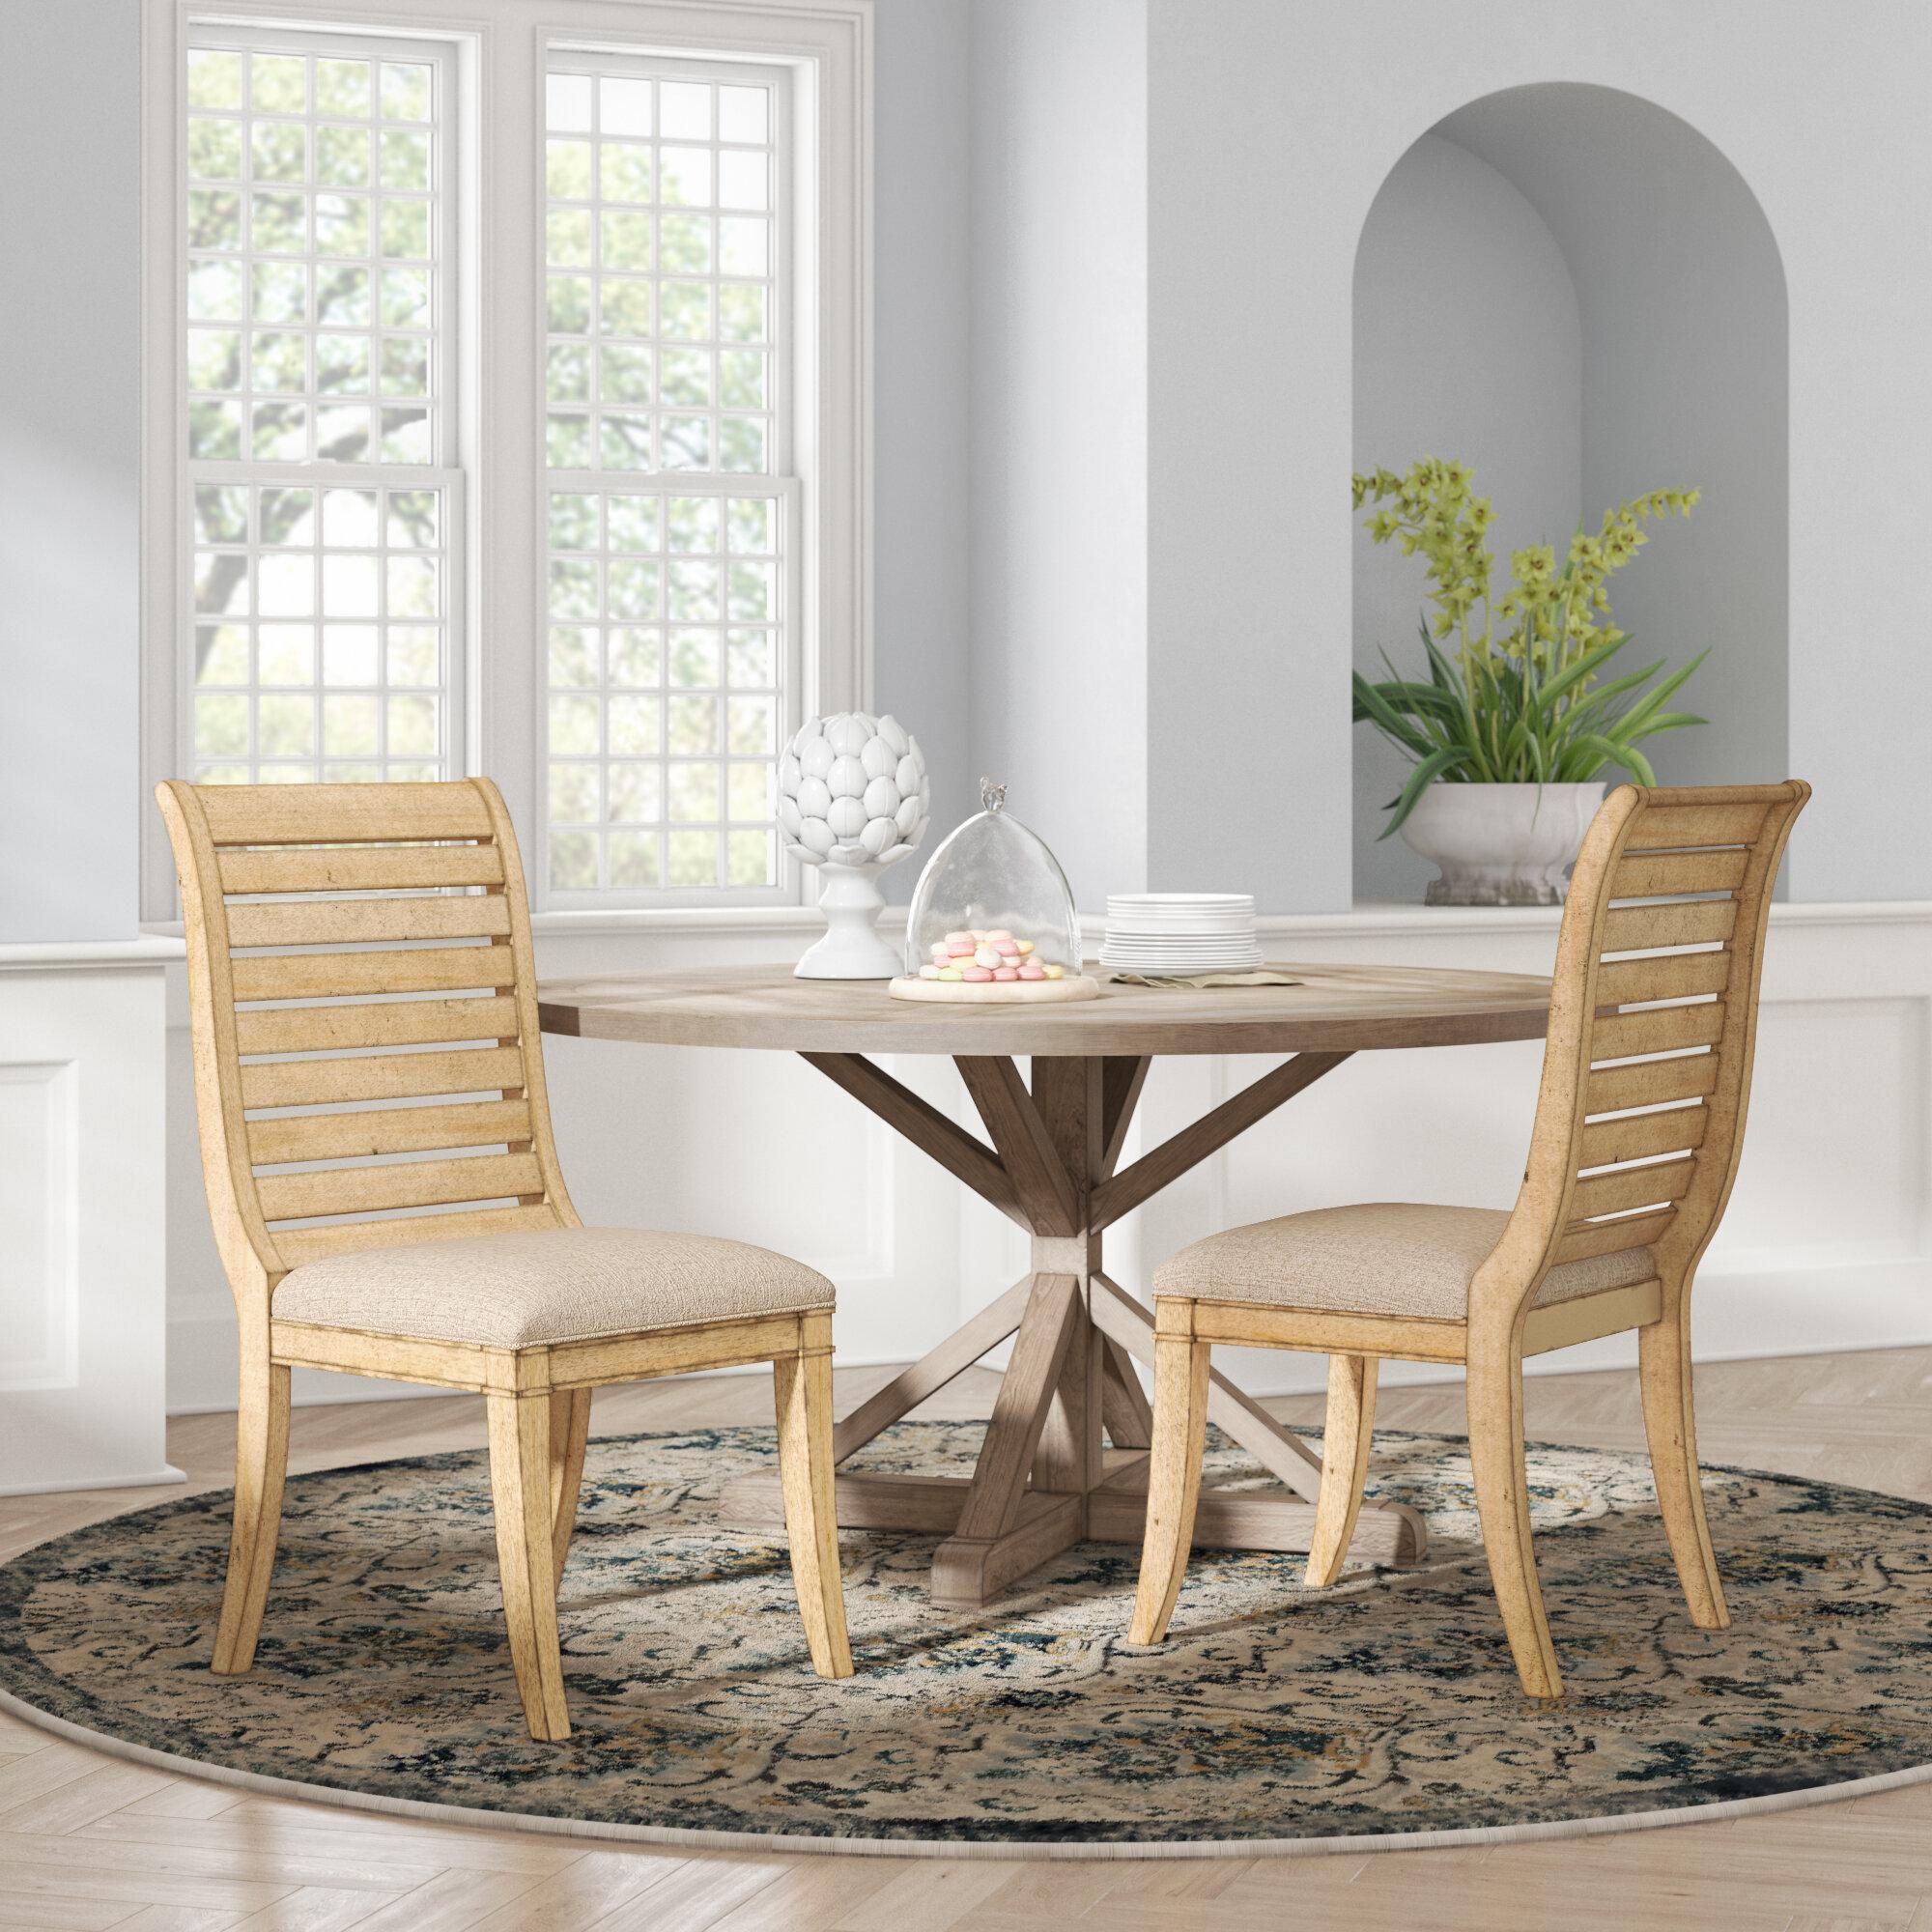 August Grove Koffler Side Chair Reviews Wayfair